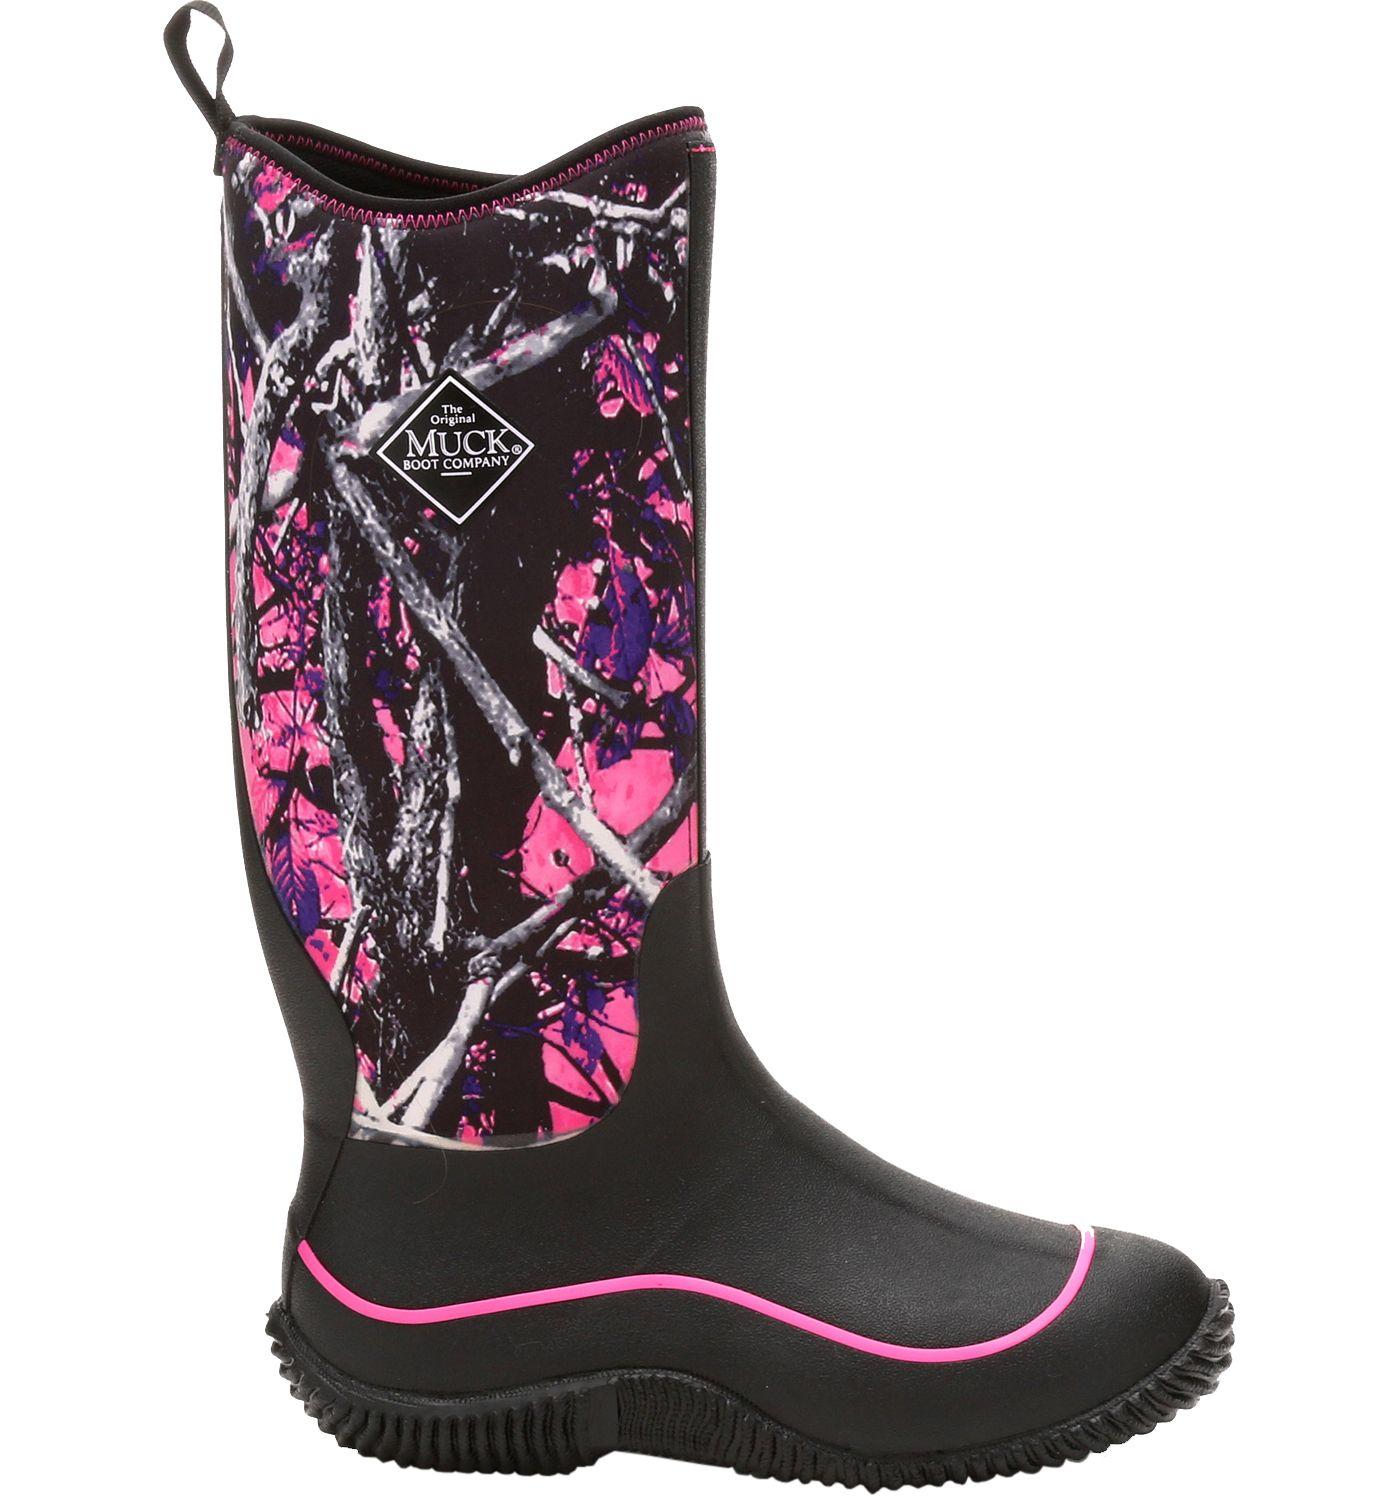 Muck Boot Women's Hale Muddy Girl Waterproof Winter Boots